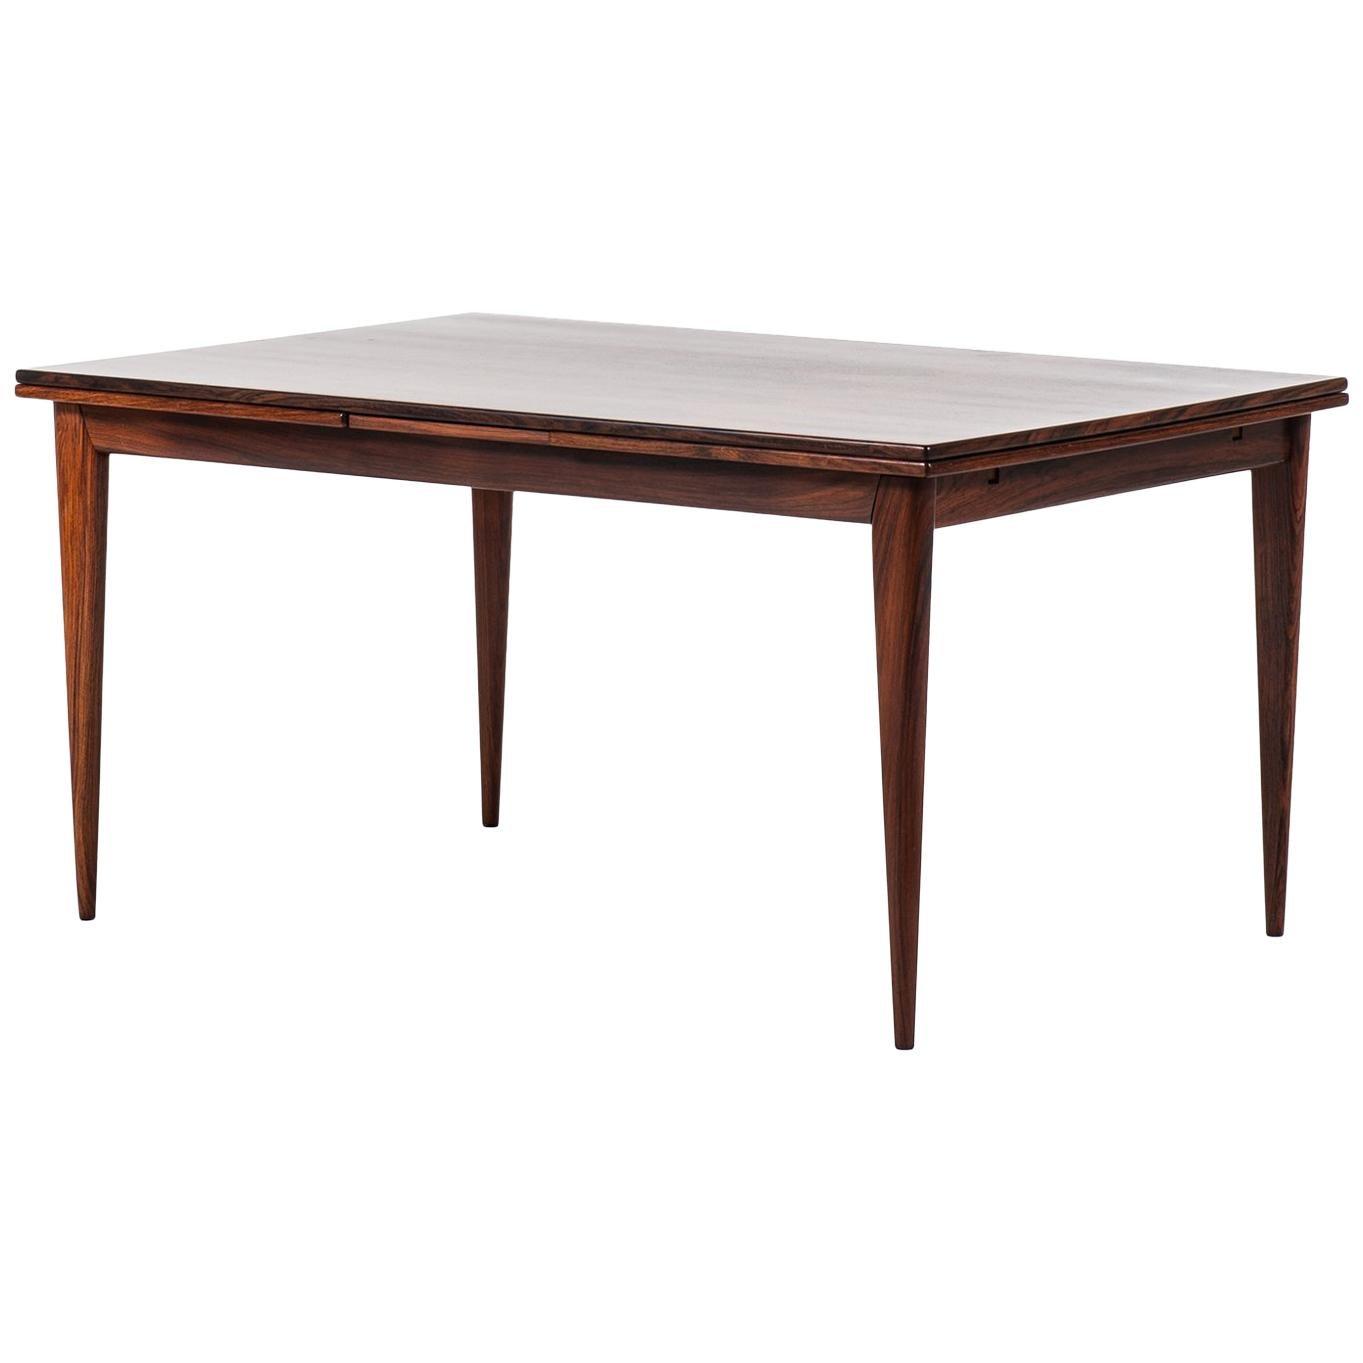 Niels O. Møller Dining Table Model 254 in Rosewood by J.L. Møllers Møbelfabrik